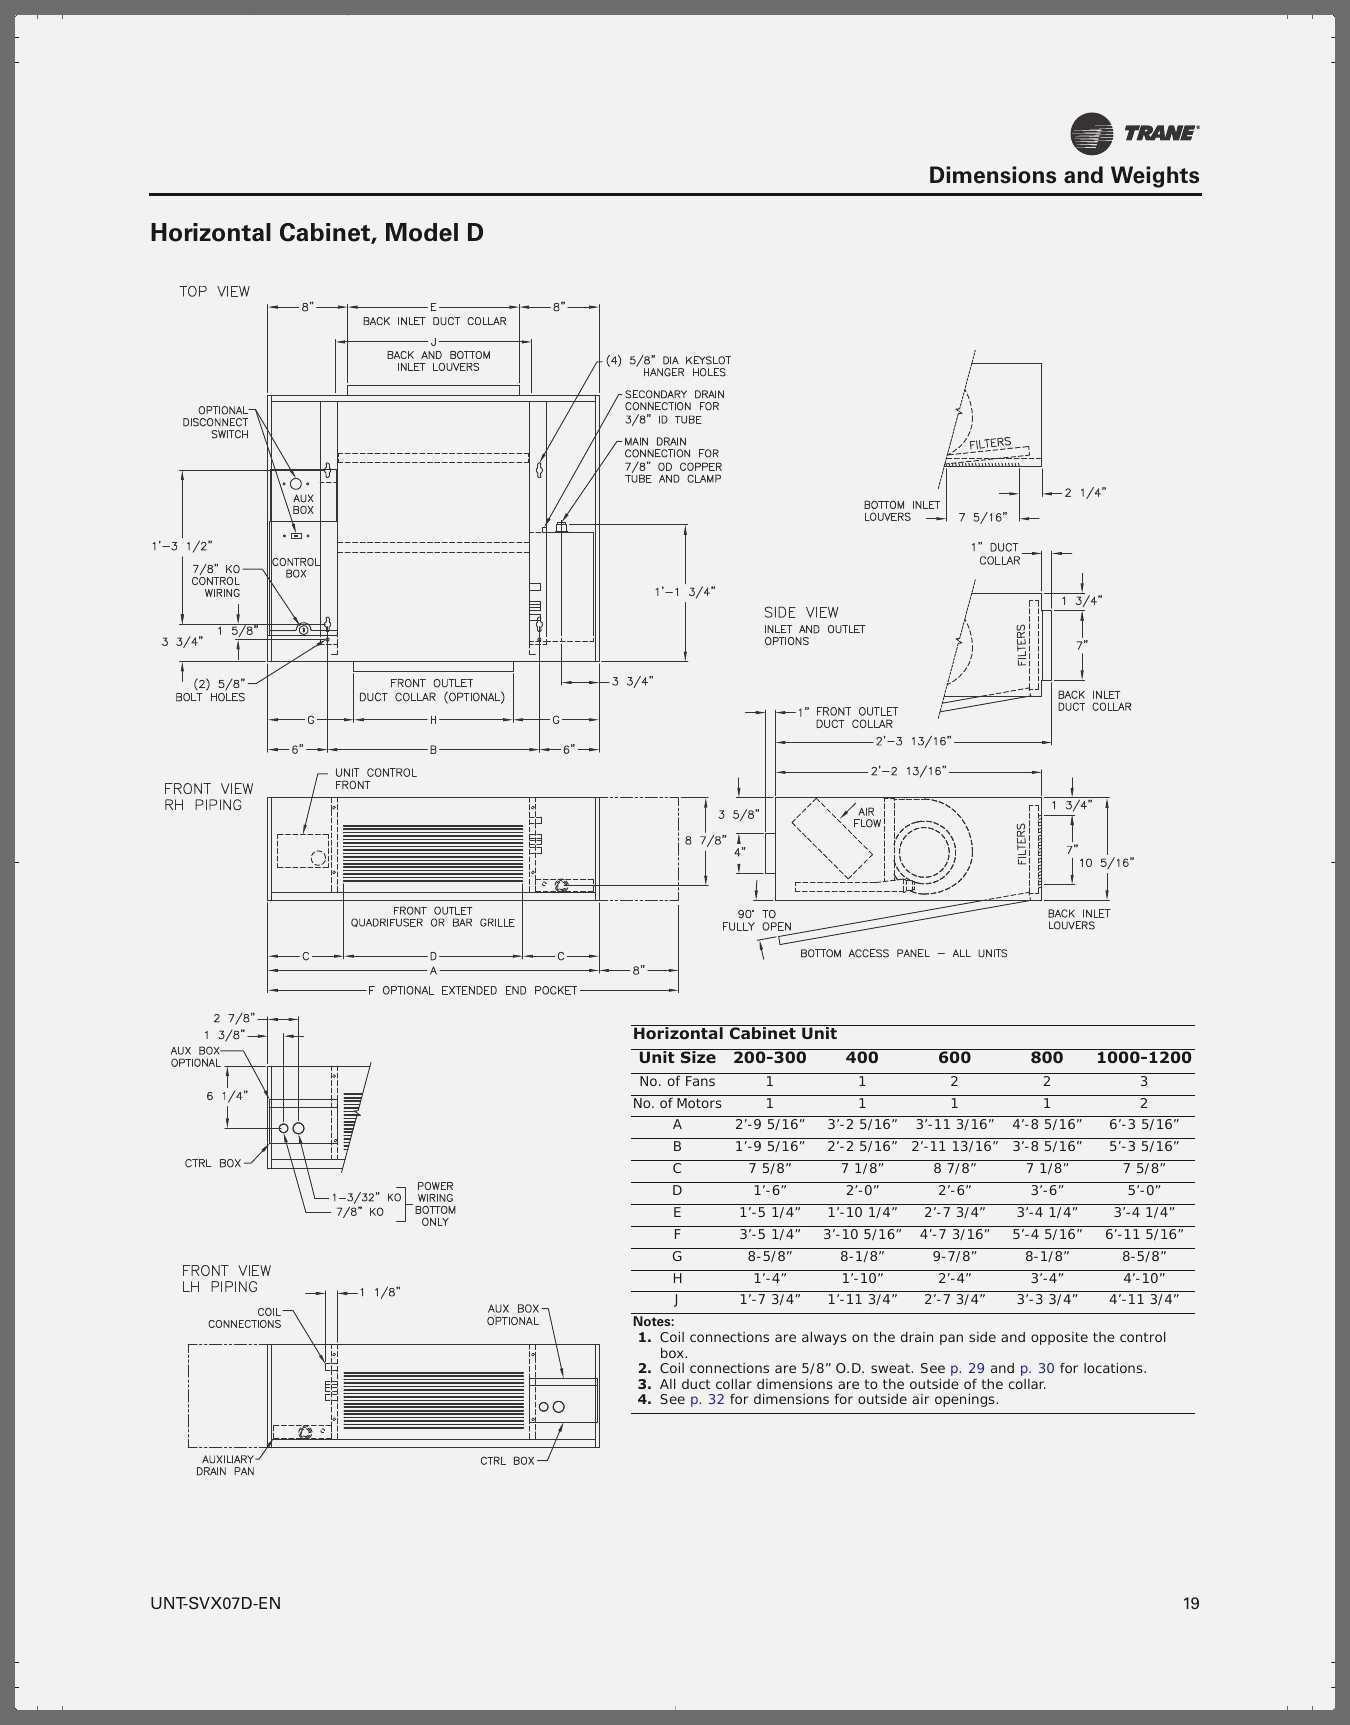 Heat Tape Roof Unique Electric Heat Strip Wiring Diagram Unique - Electric Heat Strip Wiring Diagram